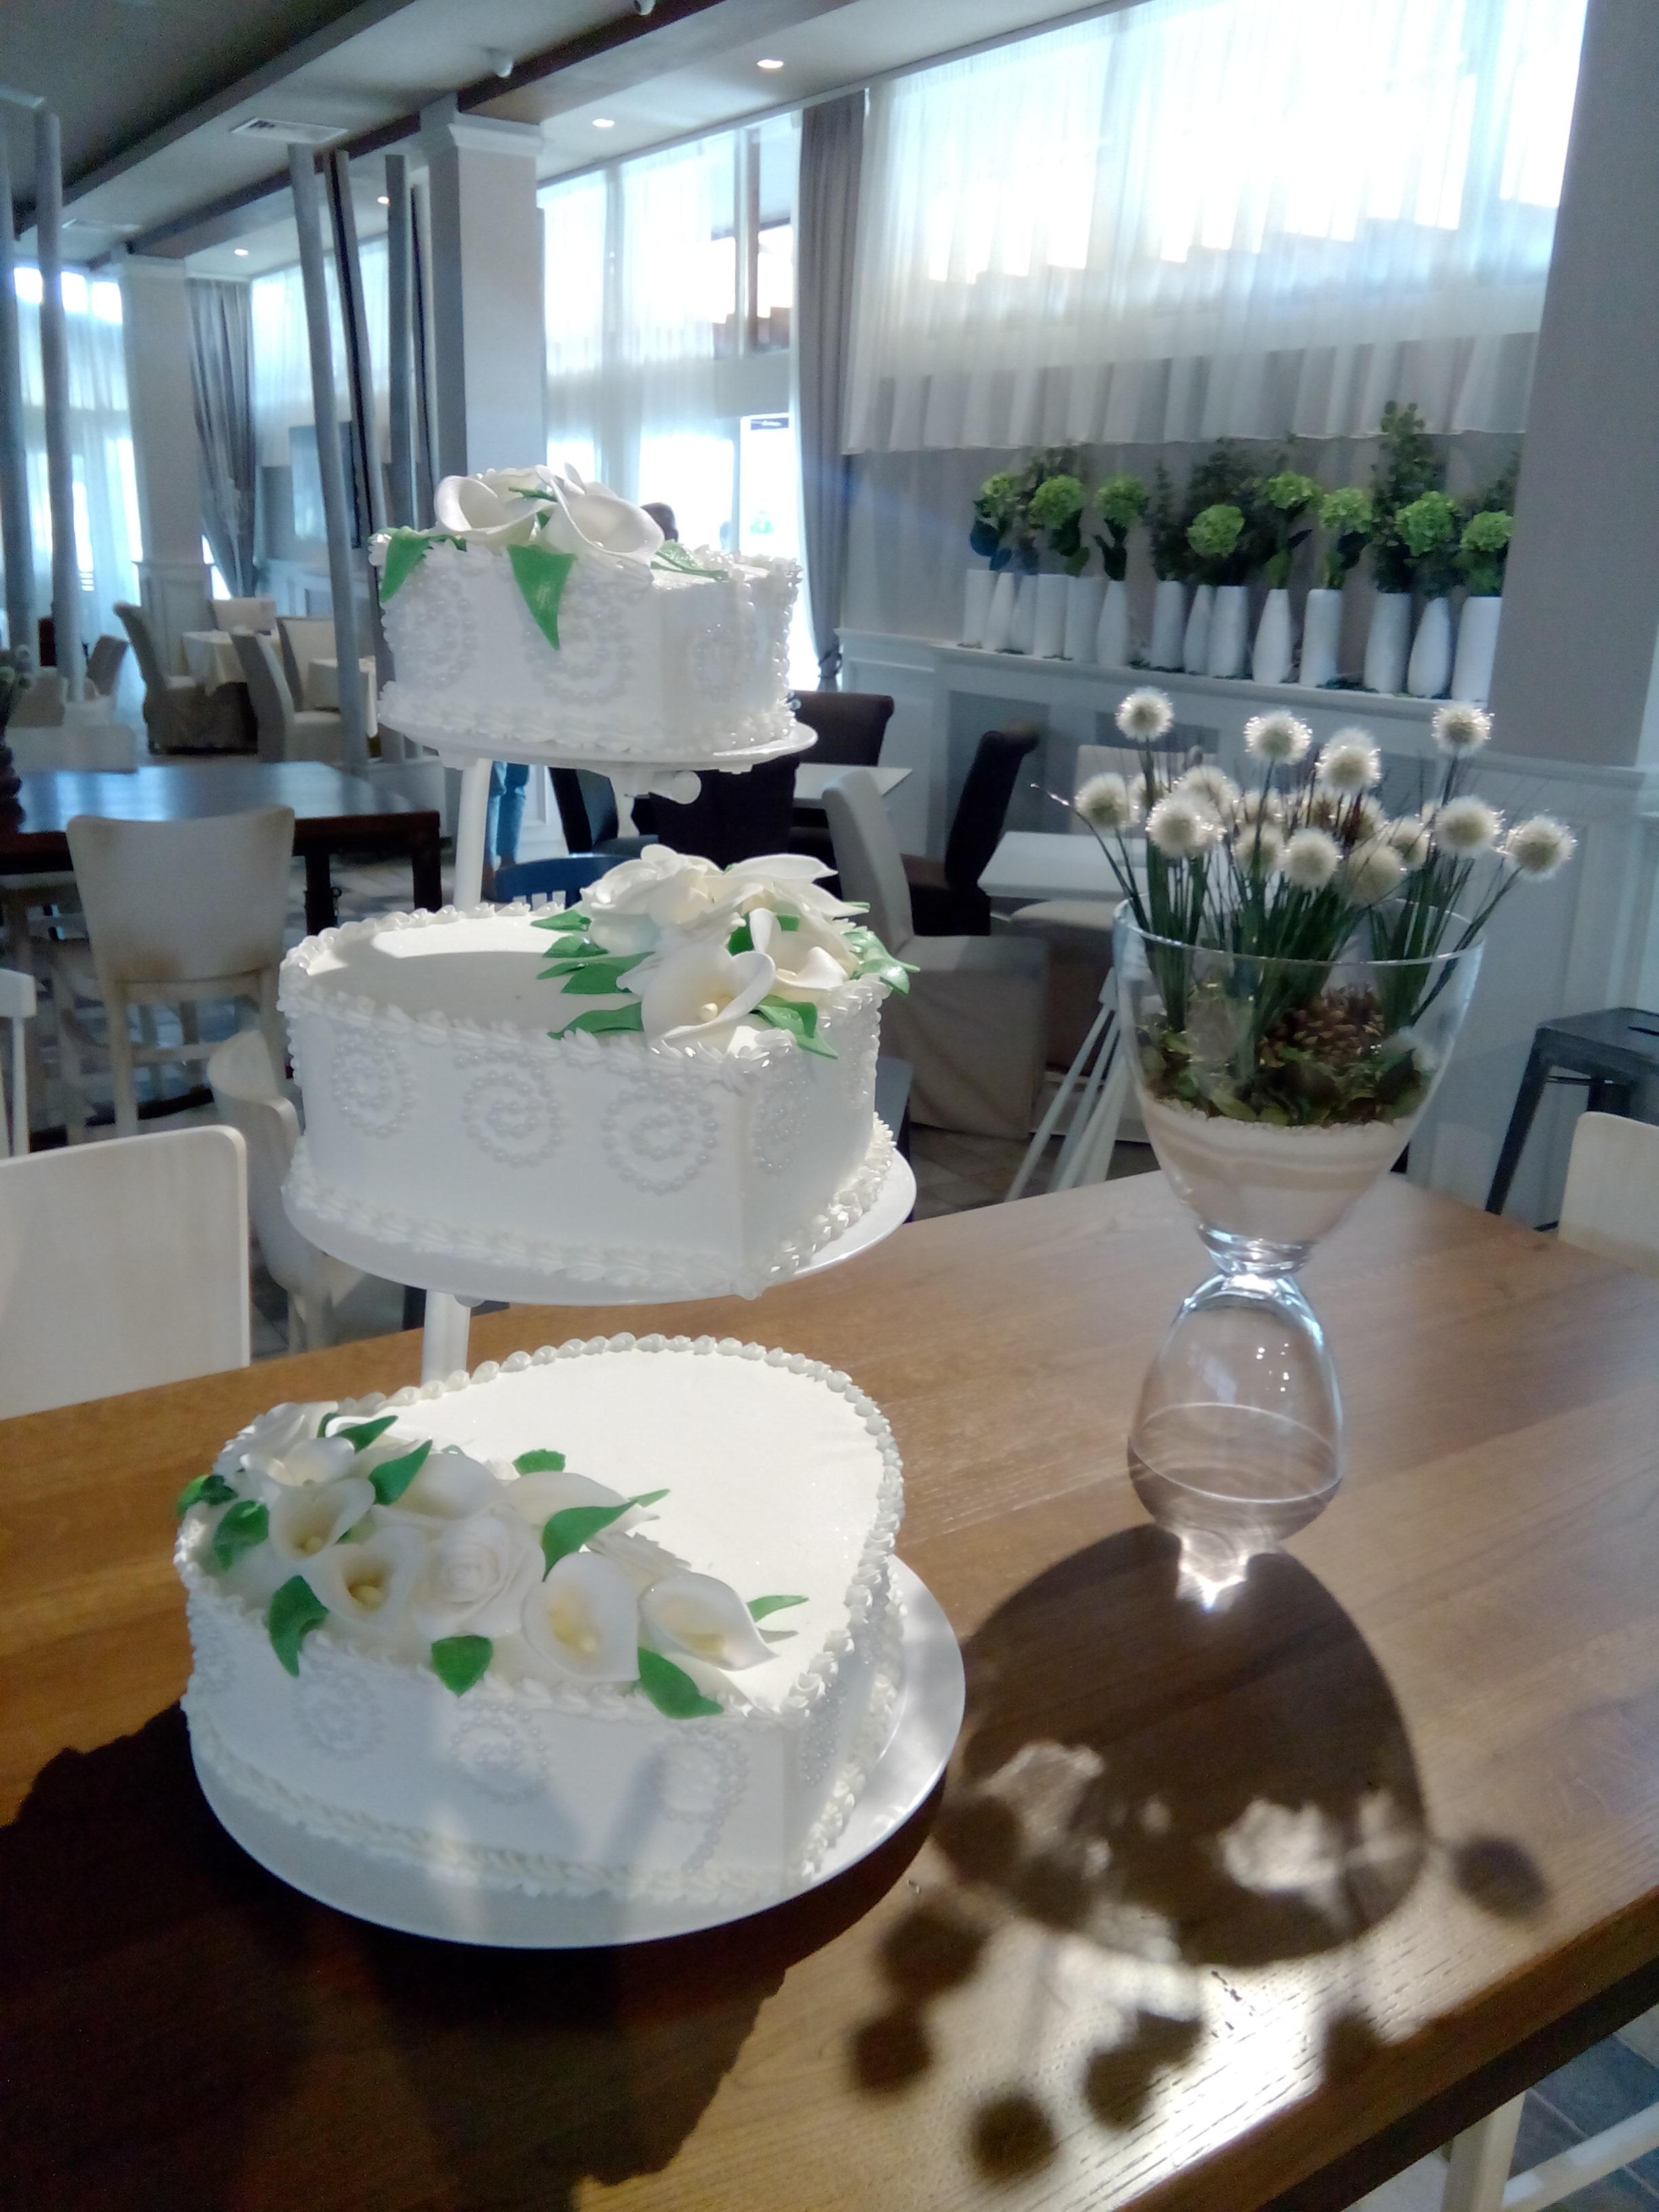 Restoran-Bagdala-Krusevac-074